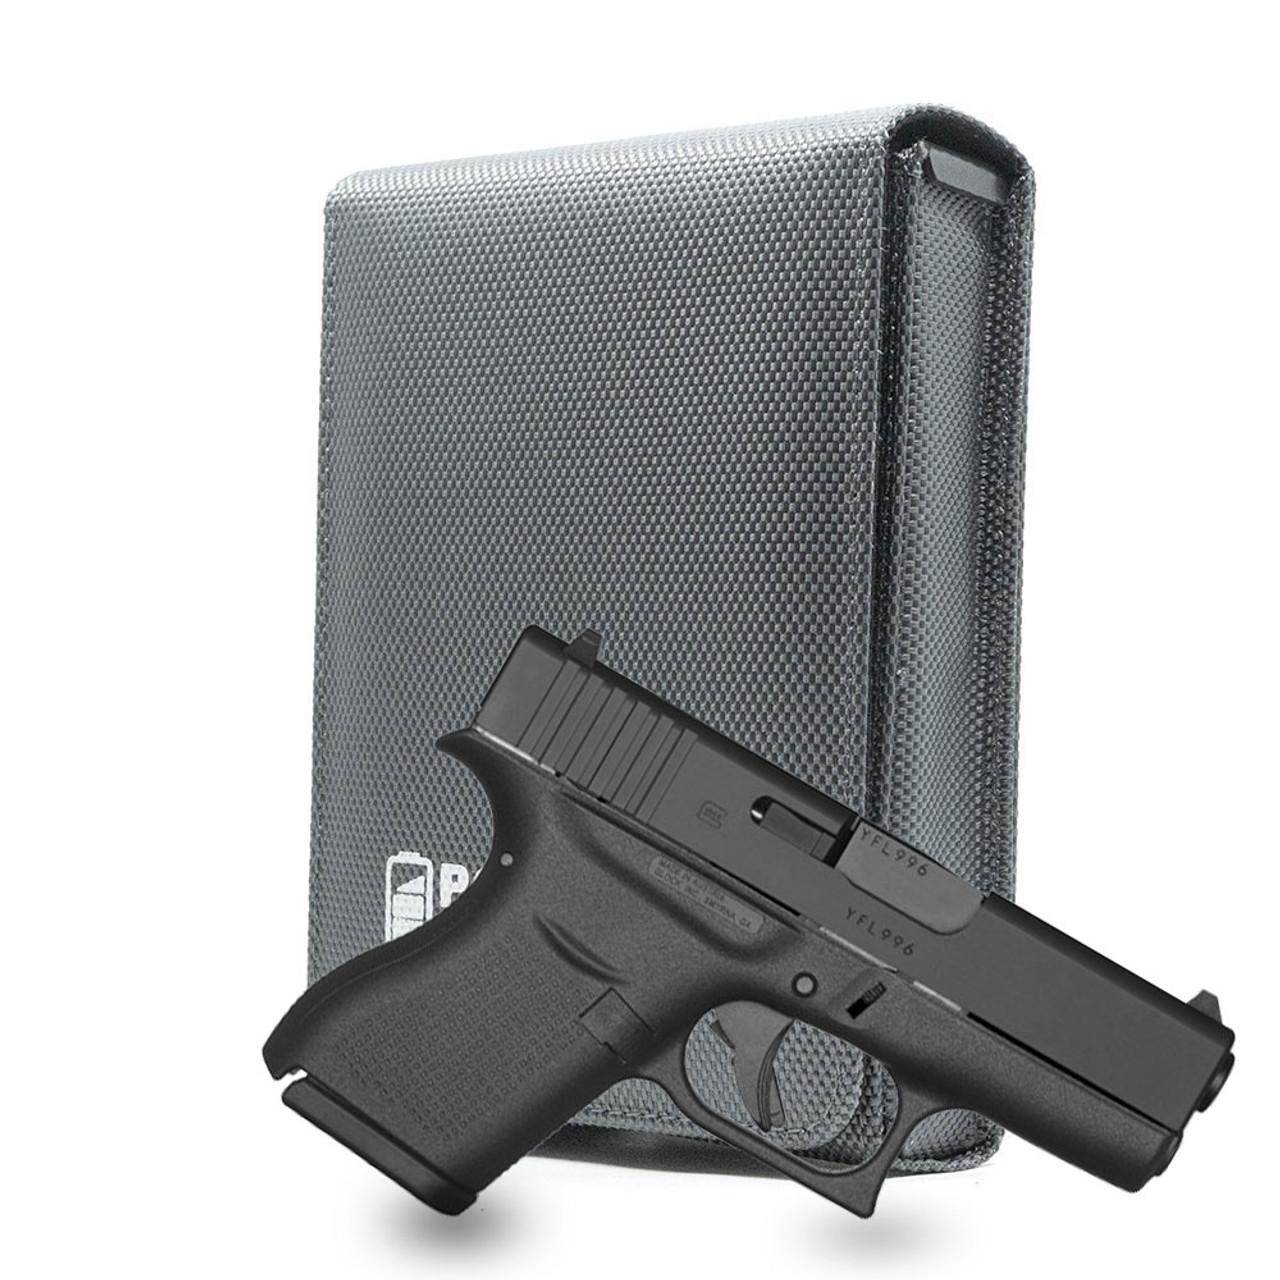 Glock 43 Grey Covert Series Holster